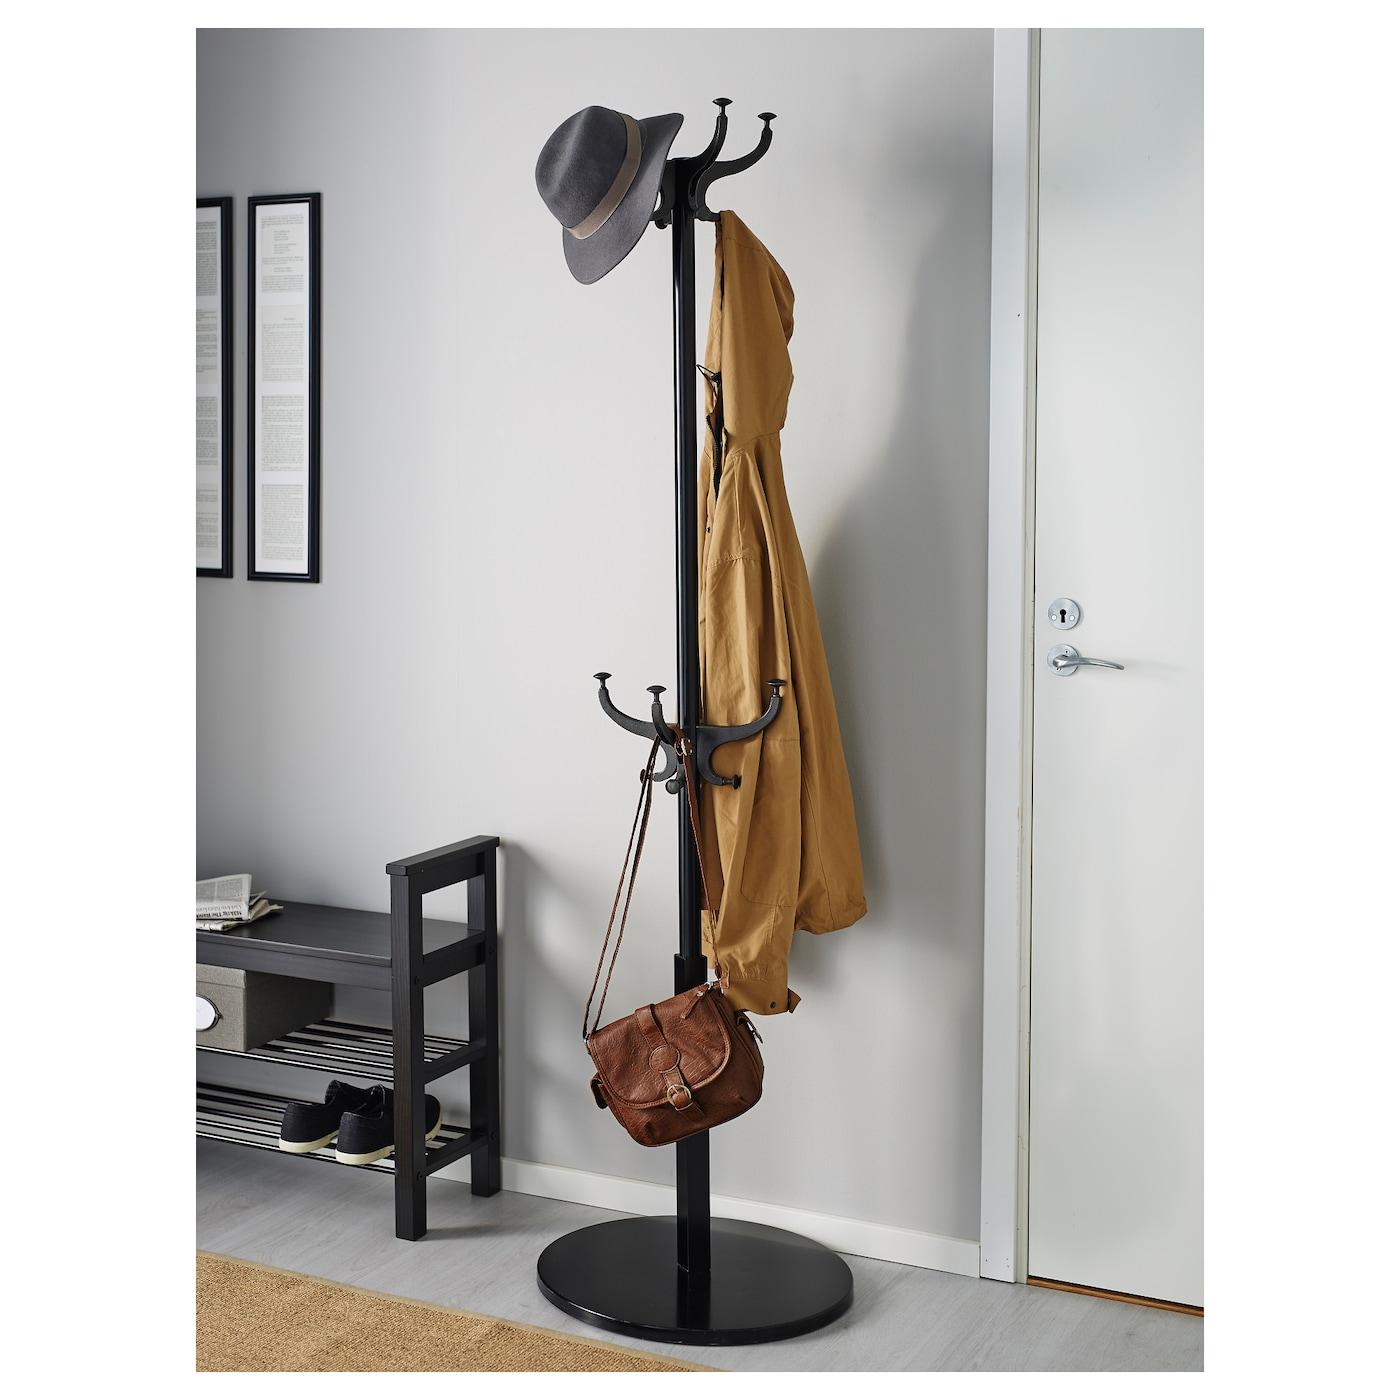 HEMNES Hat and coat stand Black 185 cm IKEA